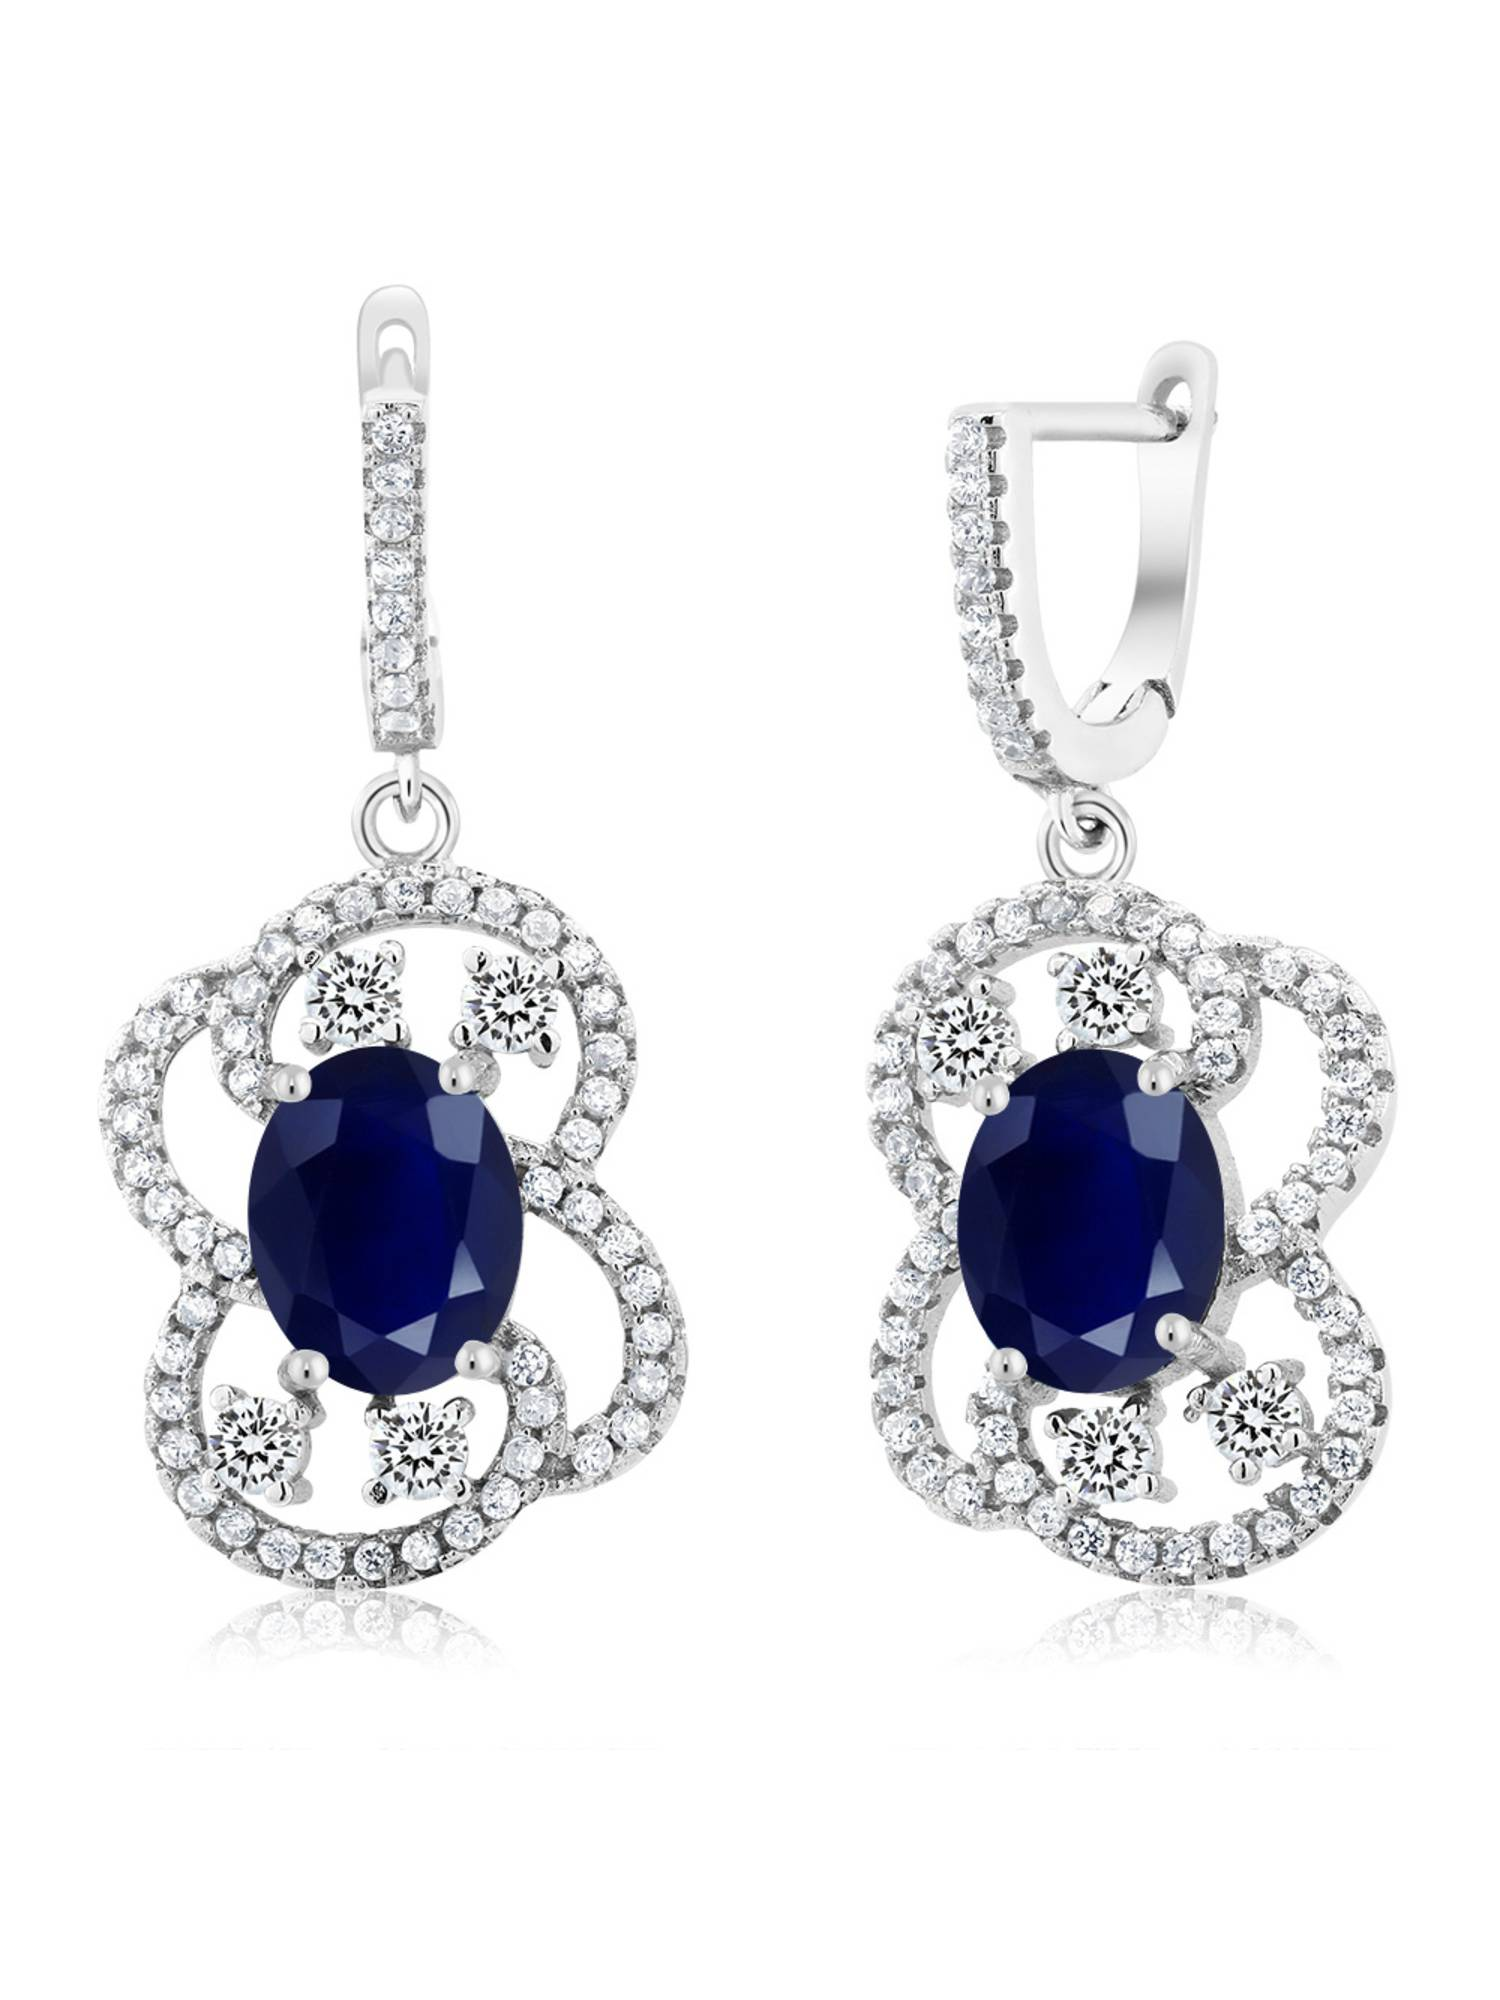 6.39 Ct Oval Blue Sapphire 925 Sterling Silver Earrings